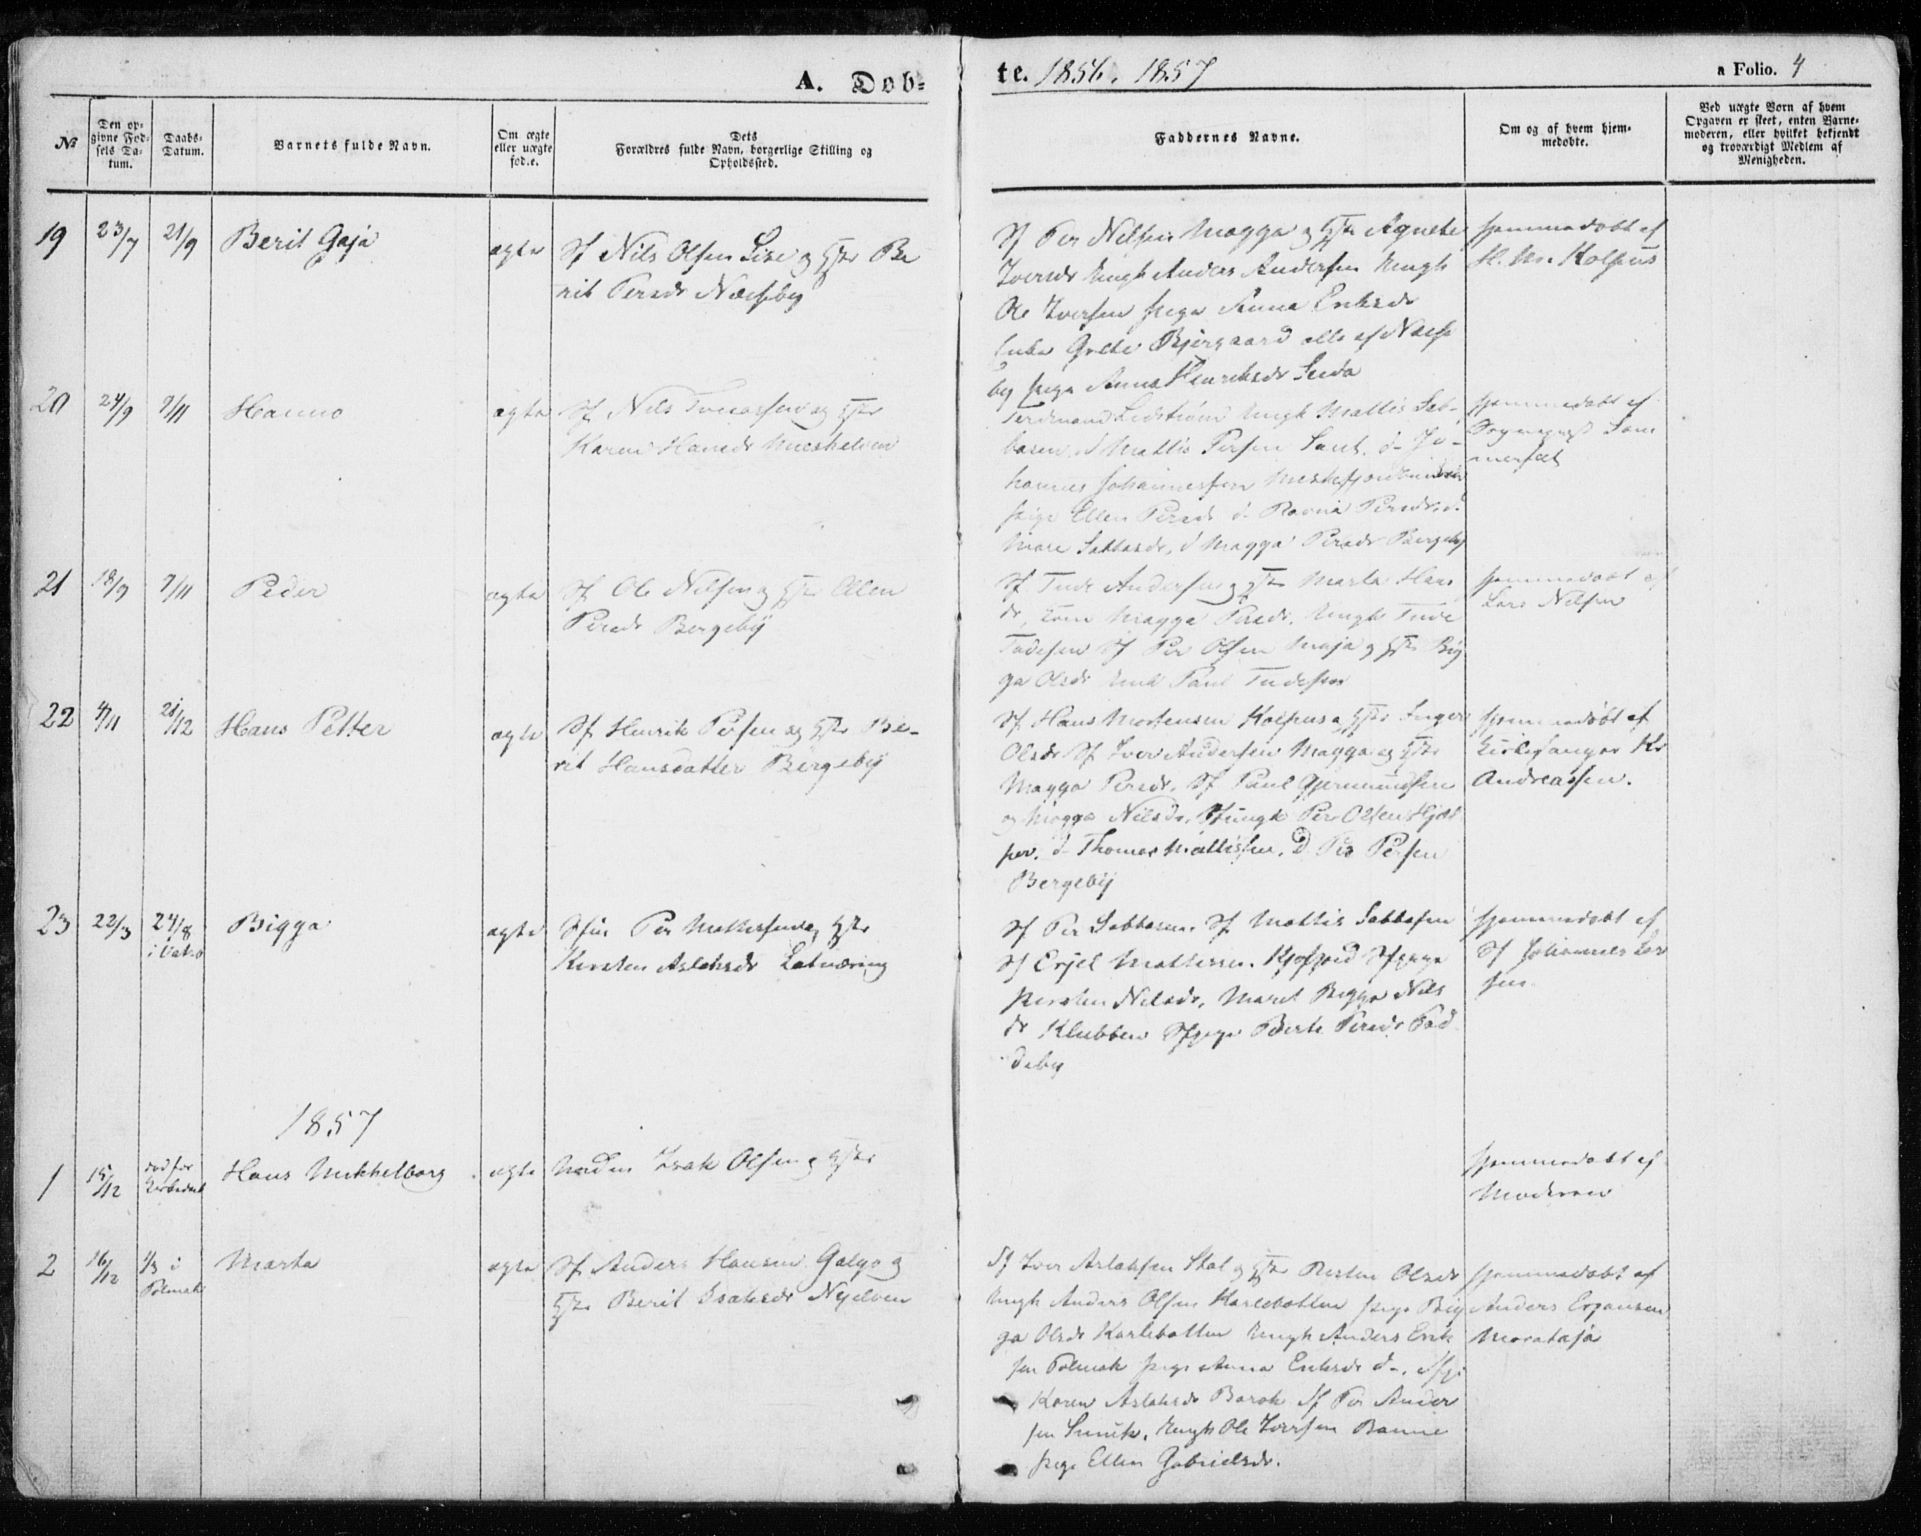 SATØ, Nesseby sokneprestkontor, H/Ha/L0002kirke: Ministerialbok nr. 2, 1856-1864, s. 4